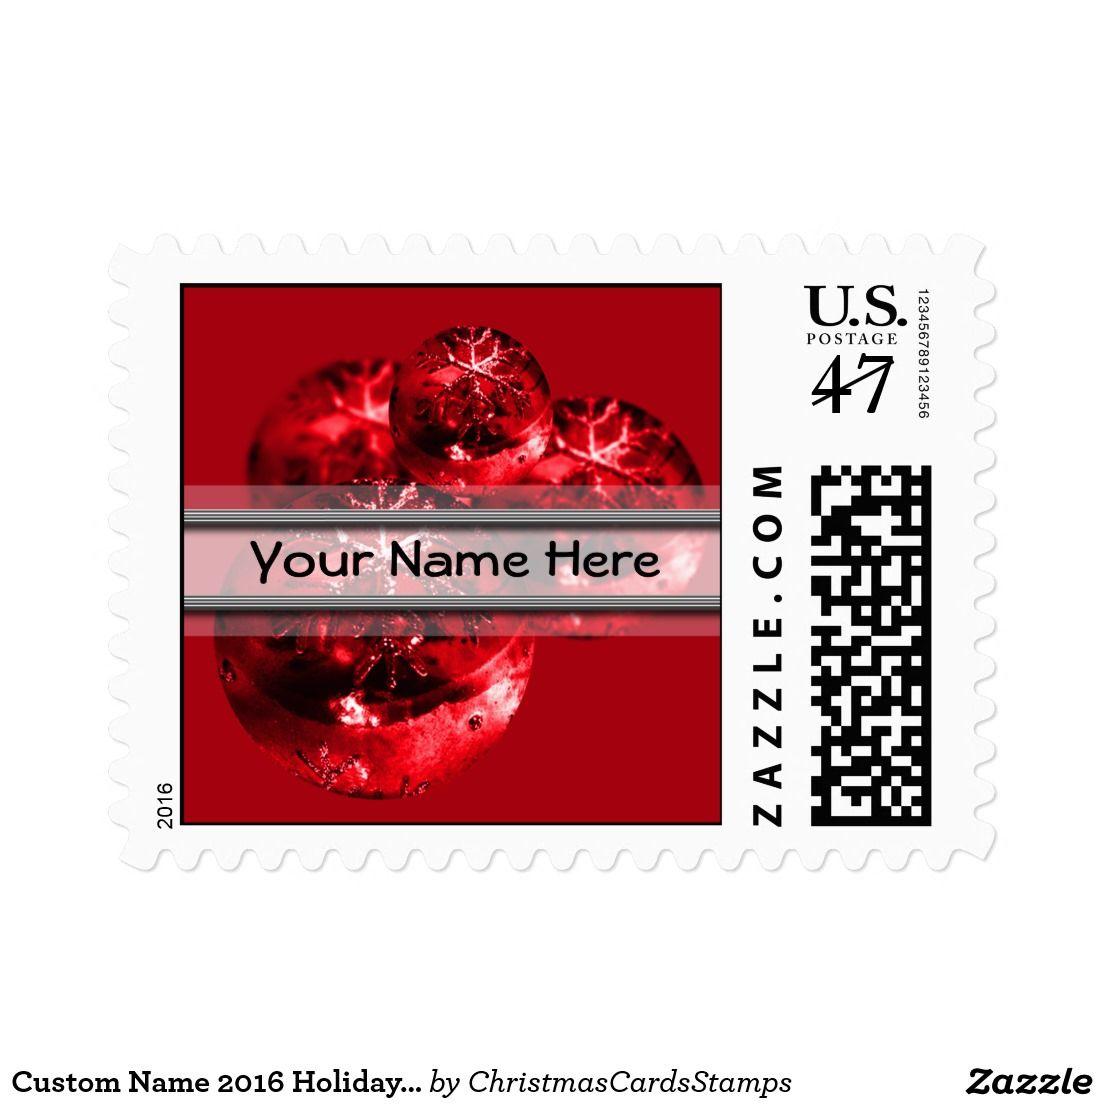 Custom Name 2016 Holiday Cards Stamp USPS | Christmas Postage Stamps ...